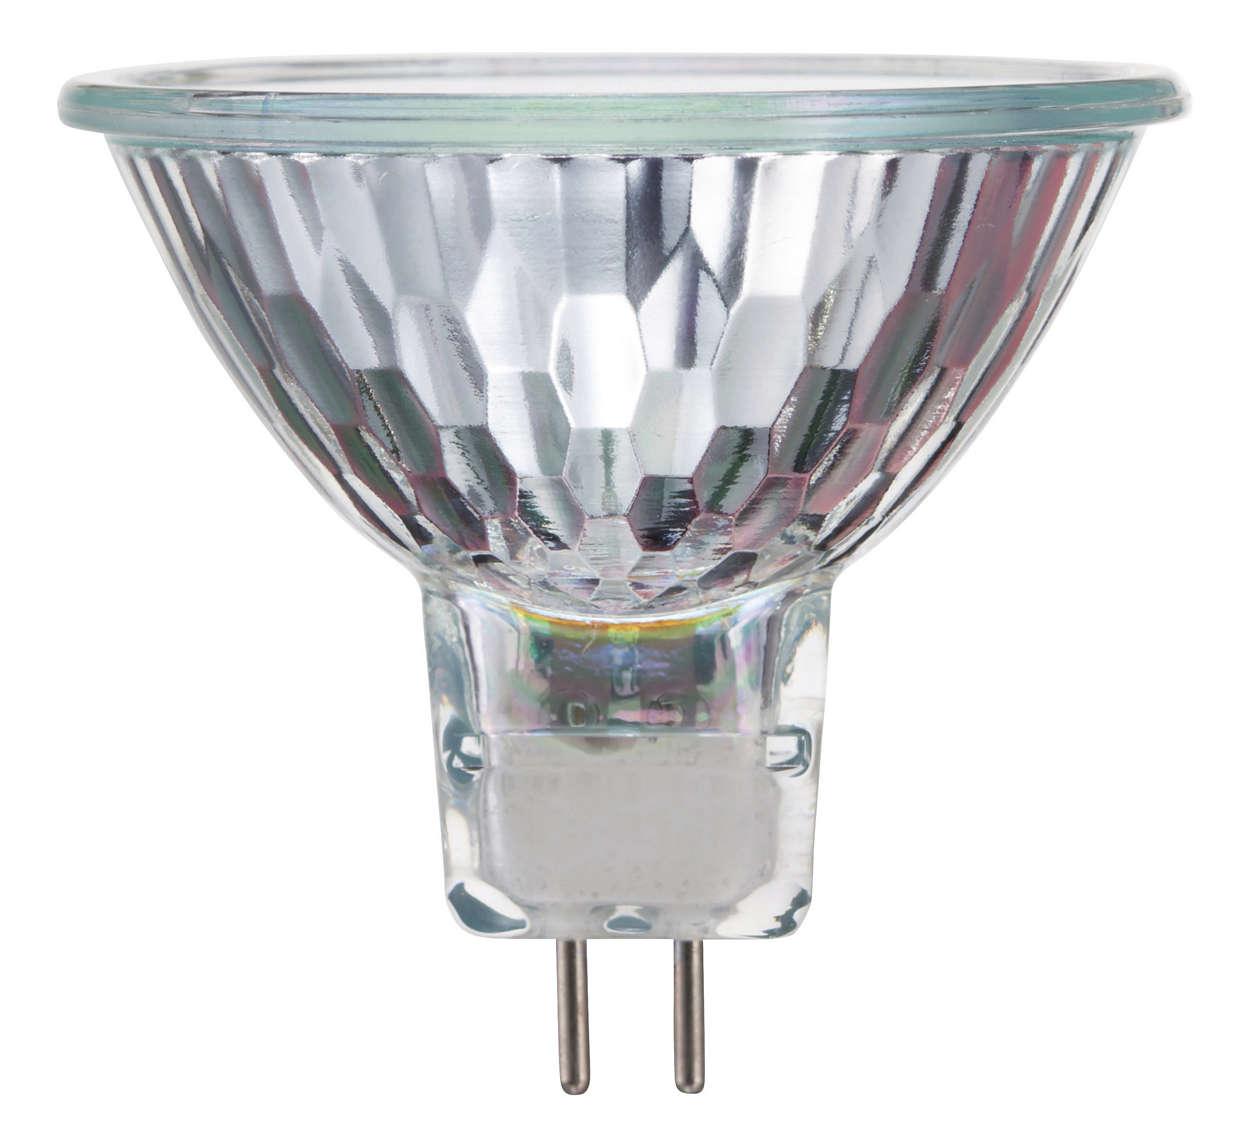 Energy Efficient Flood Lights Indoor: Halogena Energy Saver Indoor Flood Light 046677416775